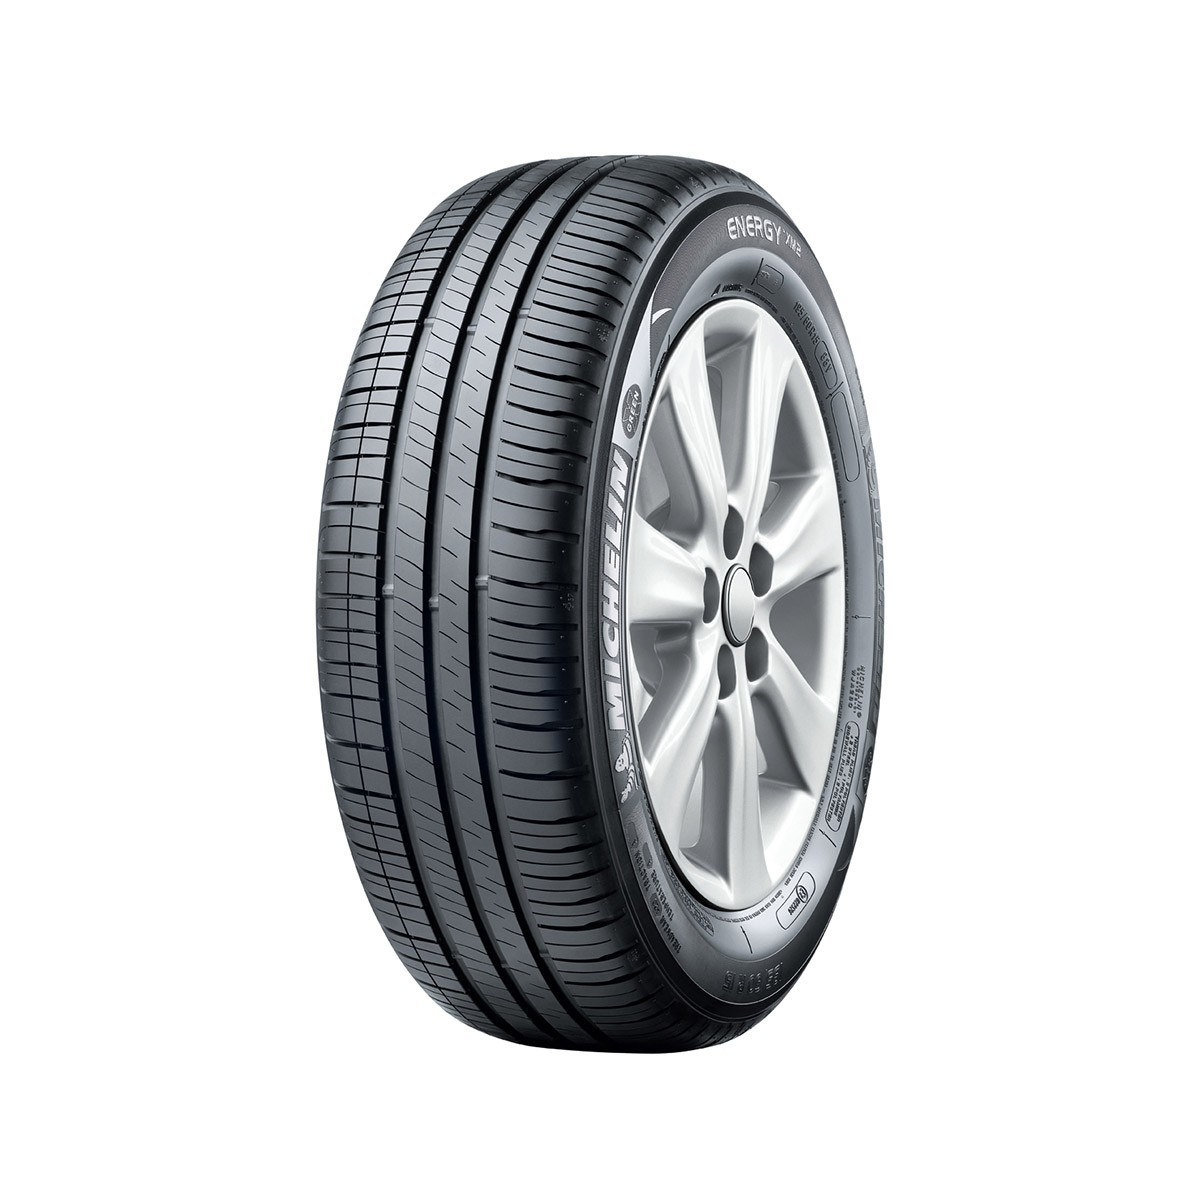 Pneu Michelin Aro 16 Energy XM2 195/55R16 87H - Original Citroen Aircross e C3 / Peugeot 208 / VW CrossFox e Fox Pepper